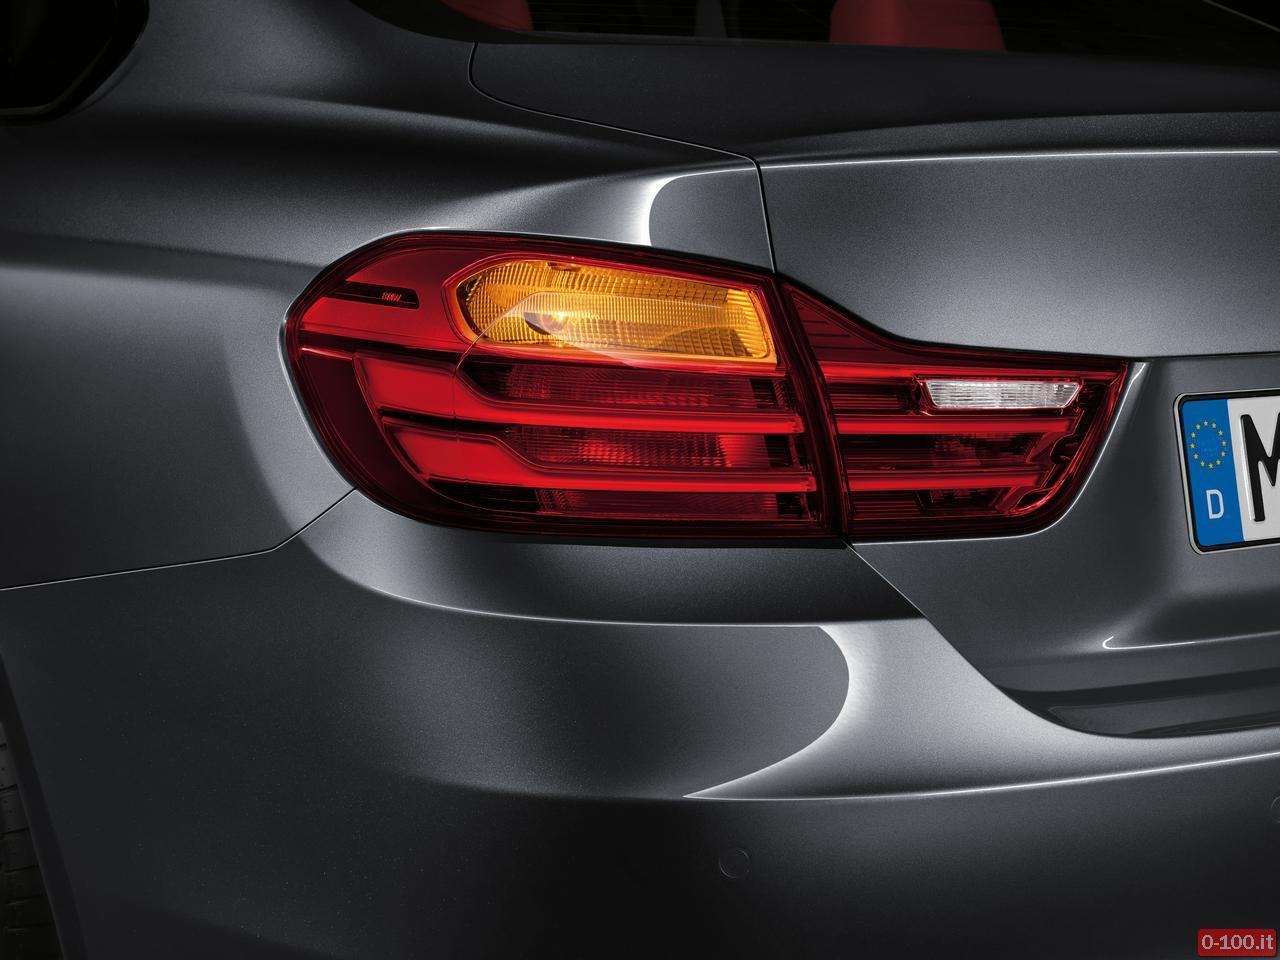 bmw_serie-4-coupé_0-100_78